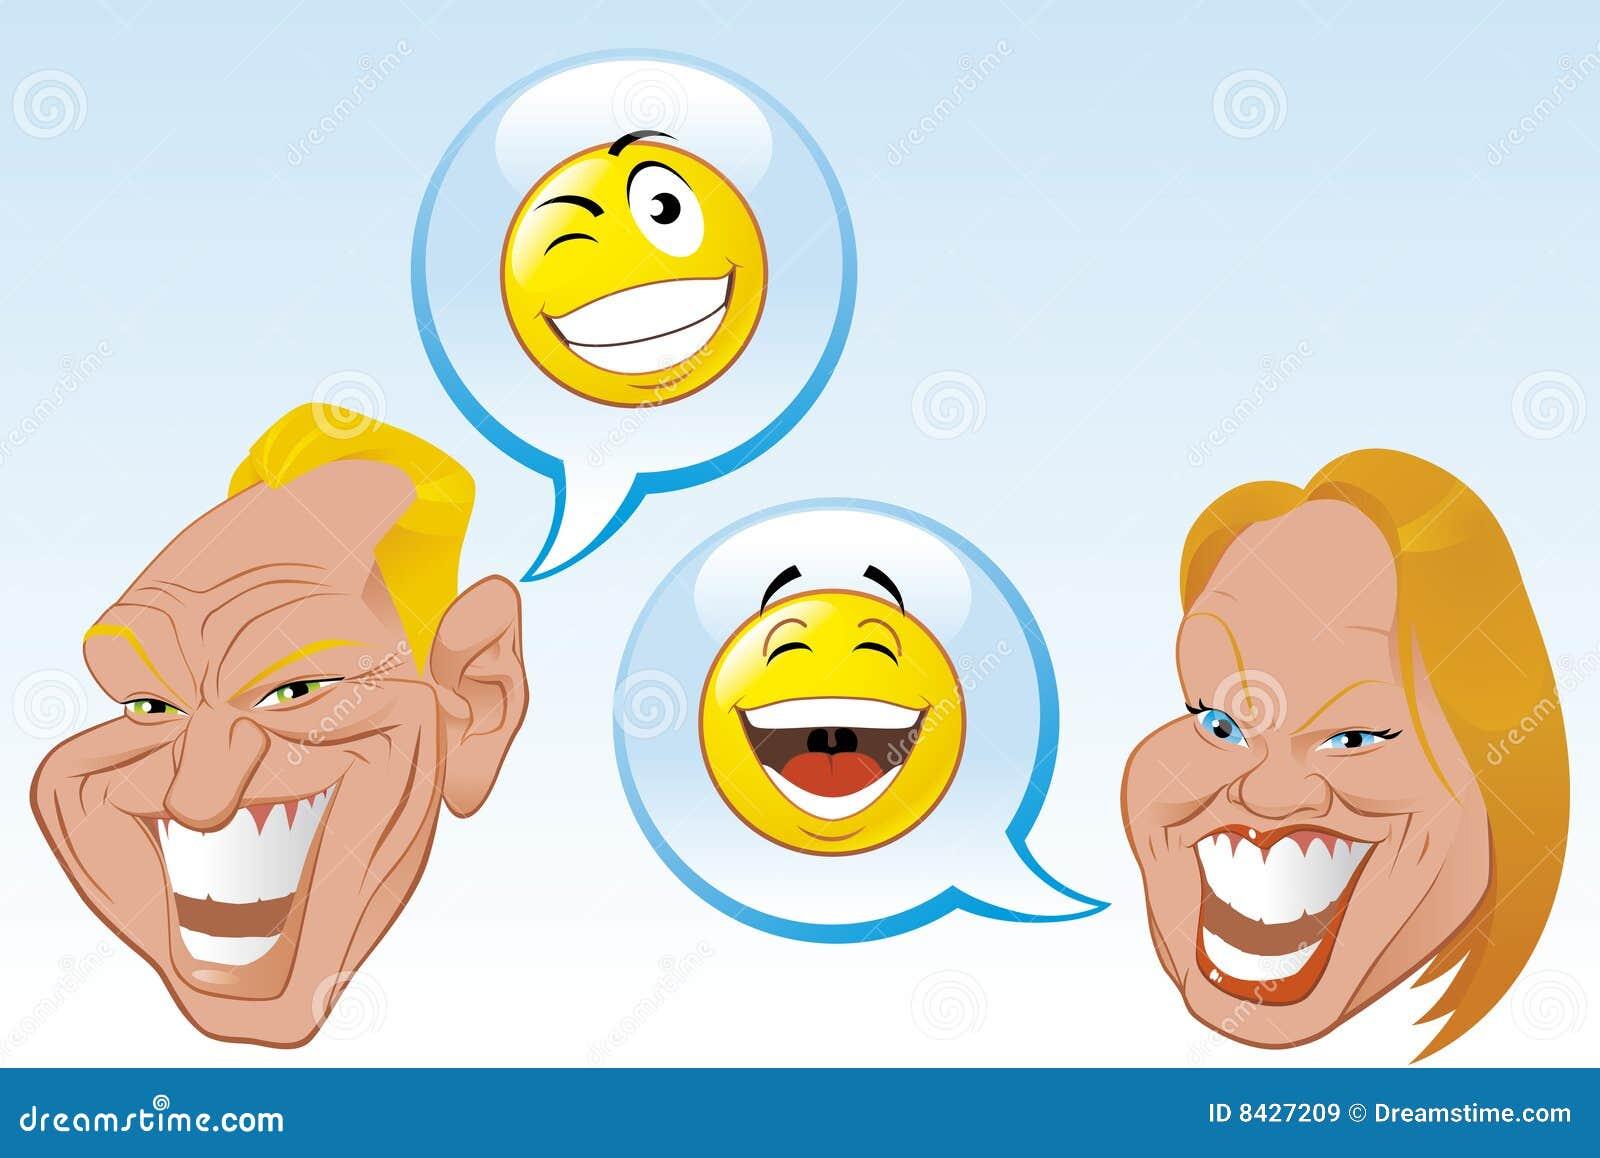 Internet chat conversation